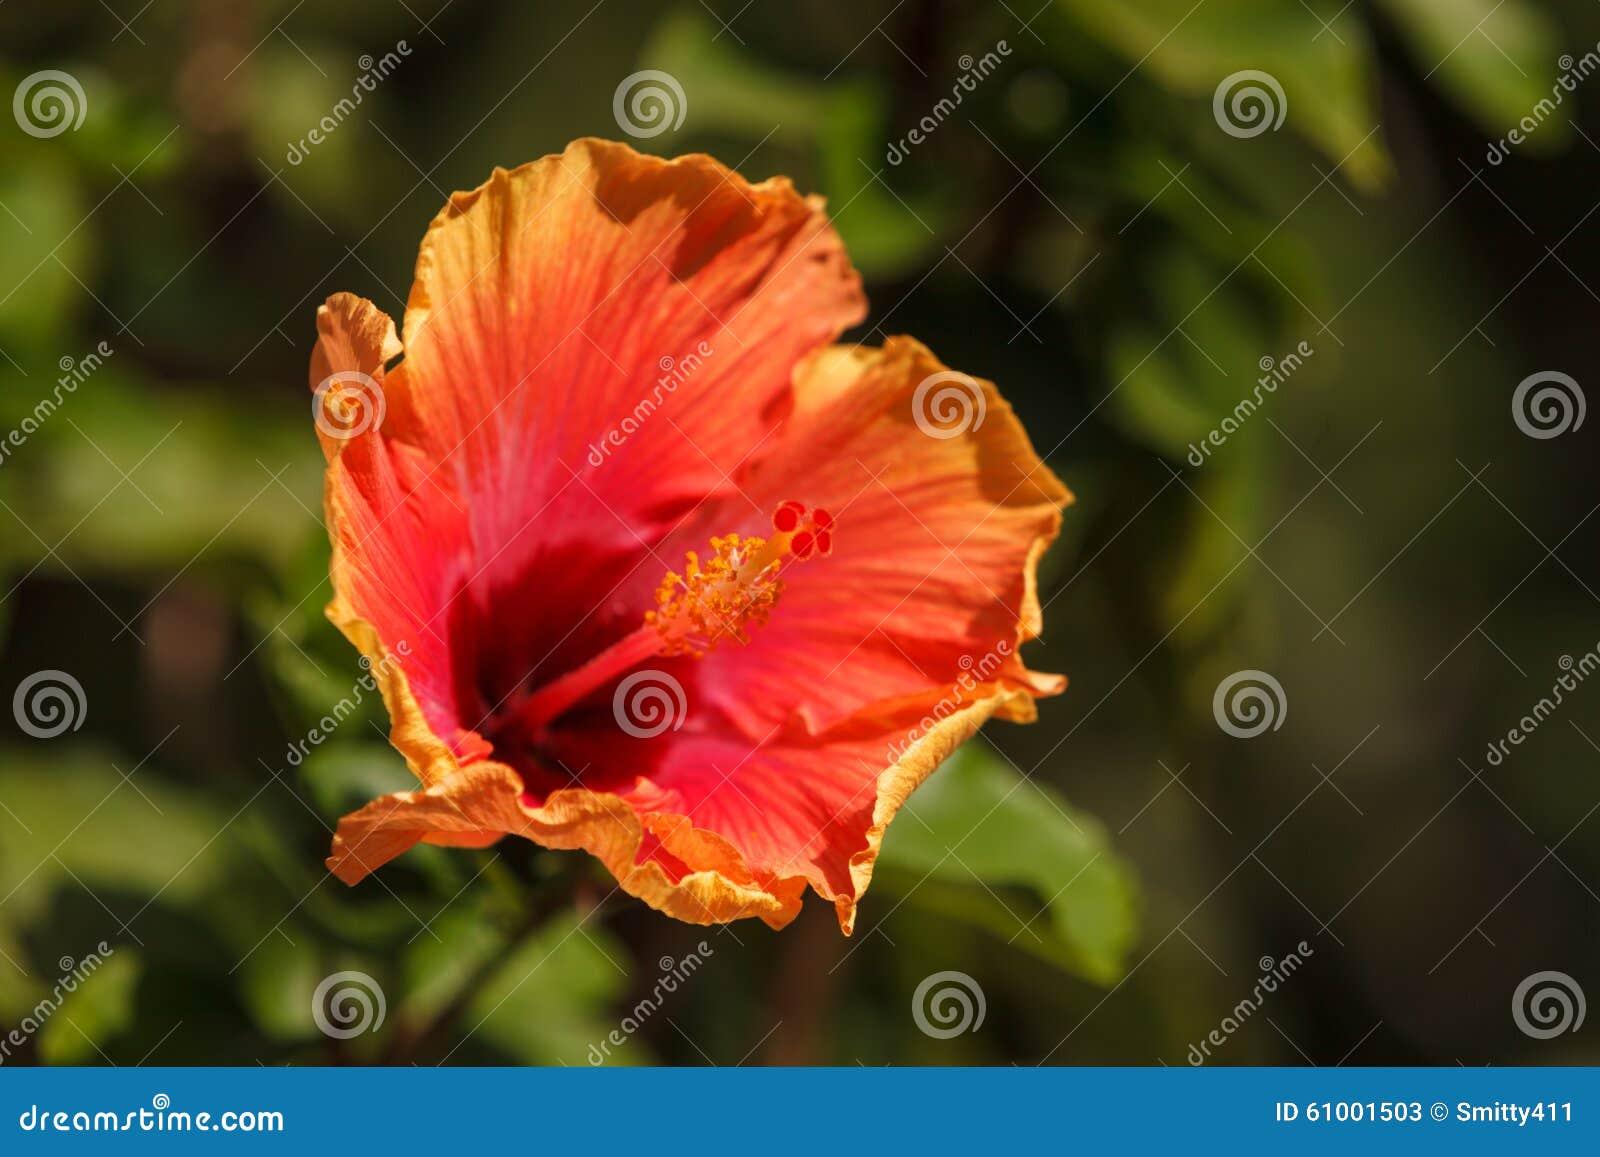 Tye Dye Colored Hibiscus Flower Blooms Stock Photo Image